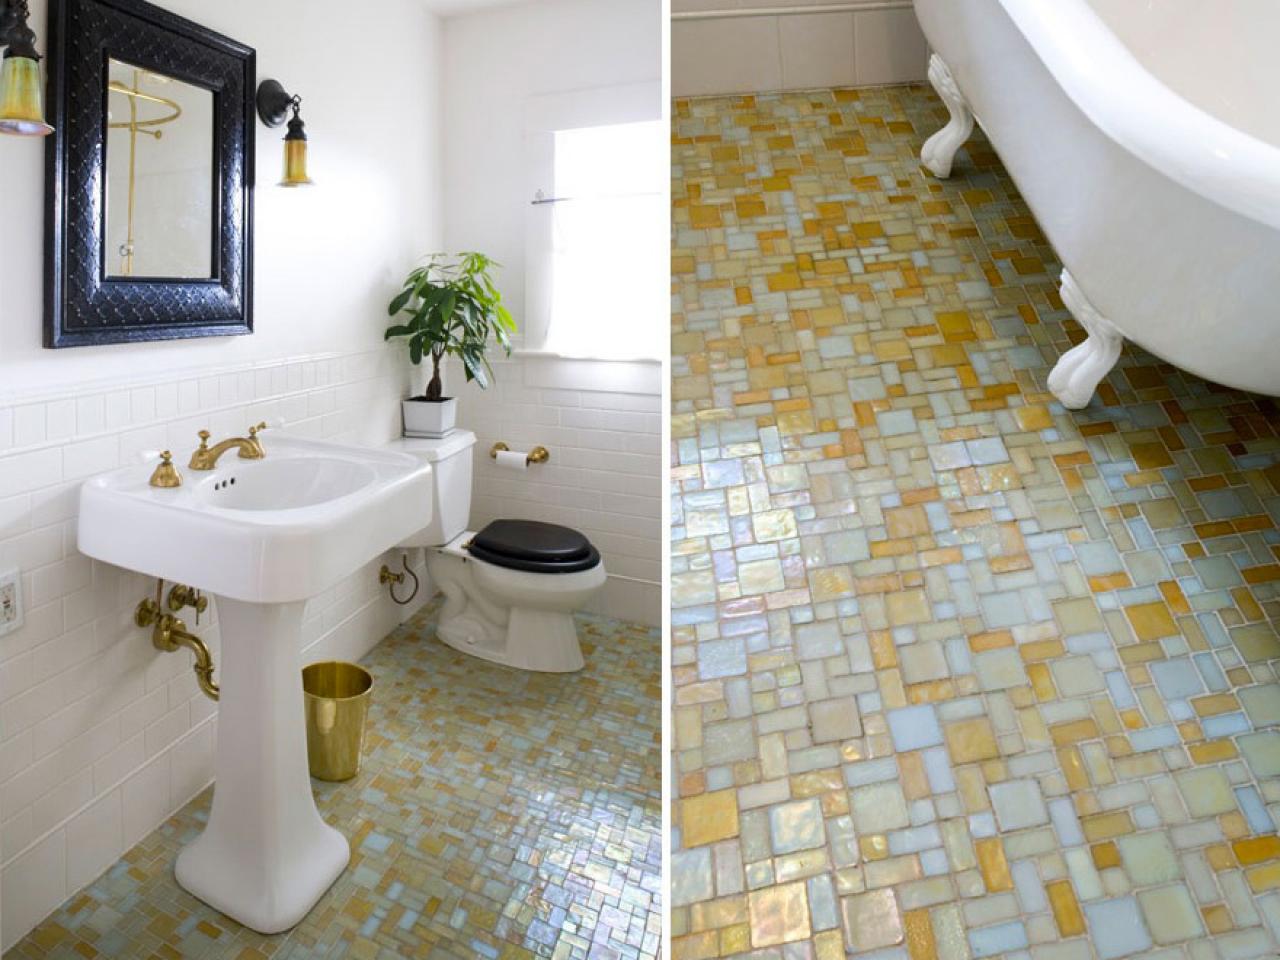 Tiled Bathroom Floors 30 Marble Bathroom Tile Ideas